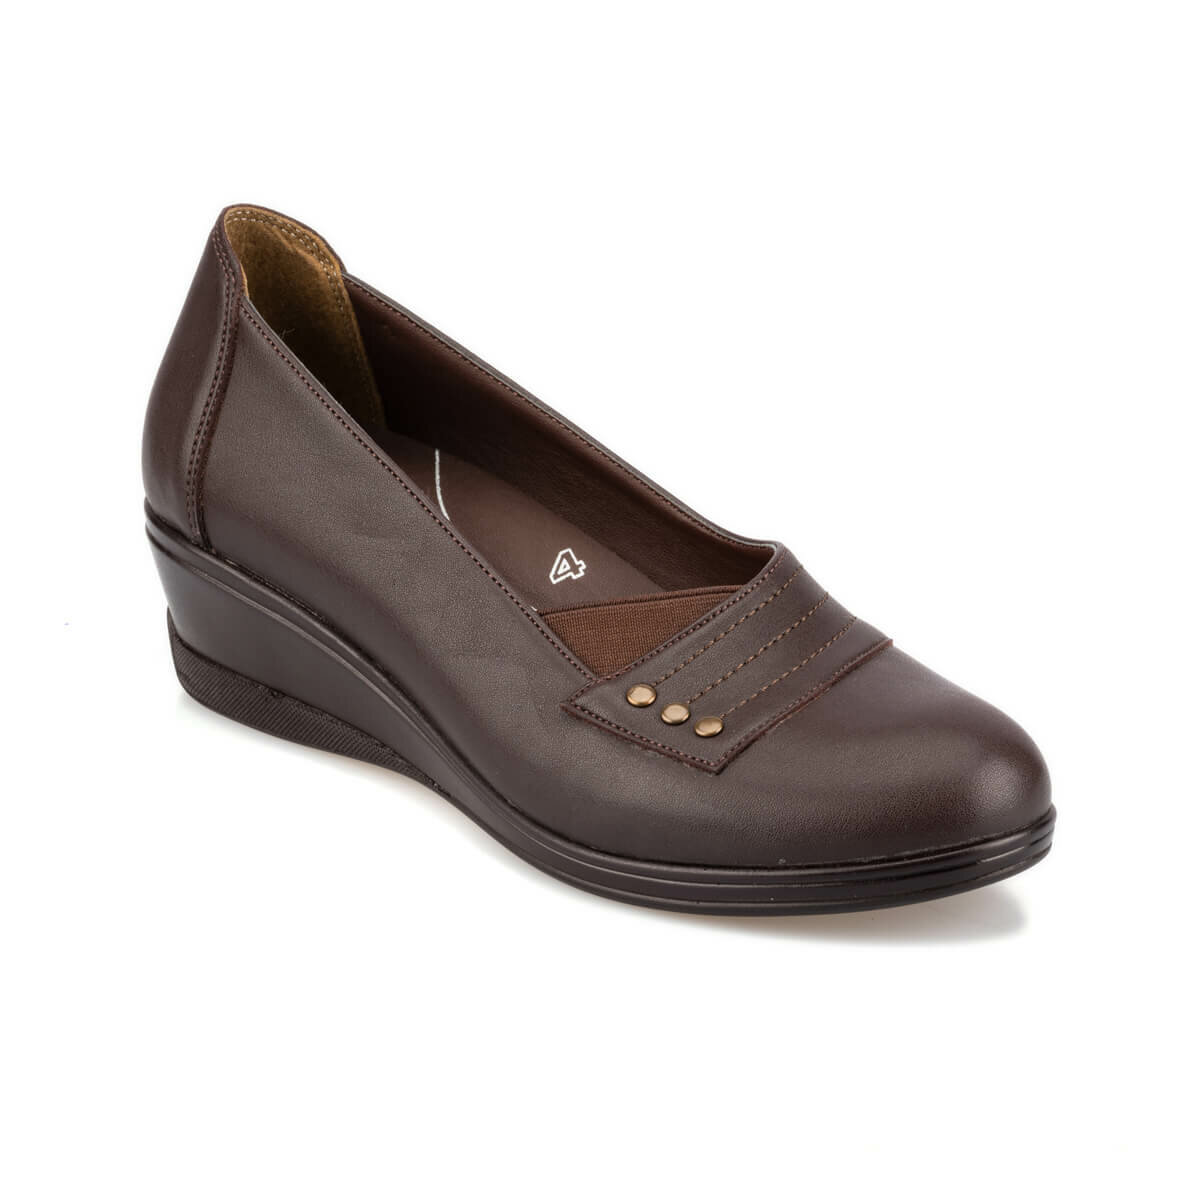 FLO 92. 101019.Z Brown Women 'S Wedges Shoes Polaris 5 Point